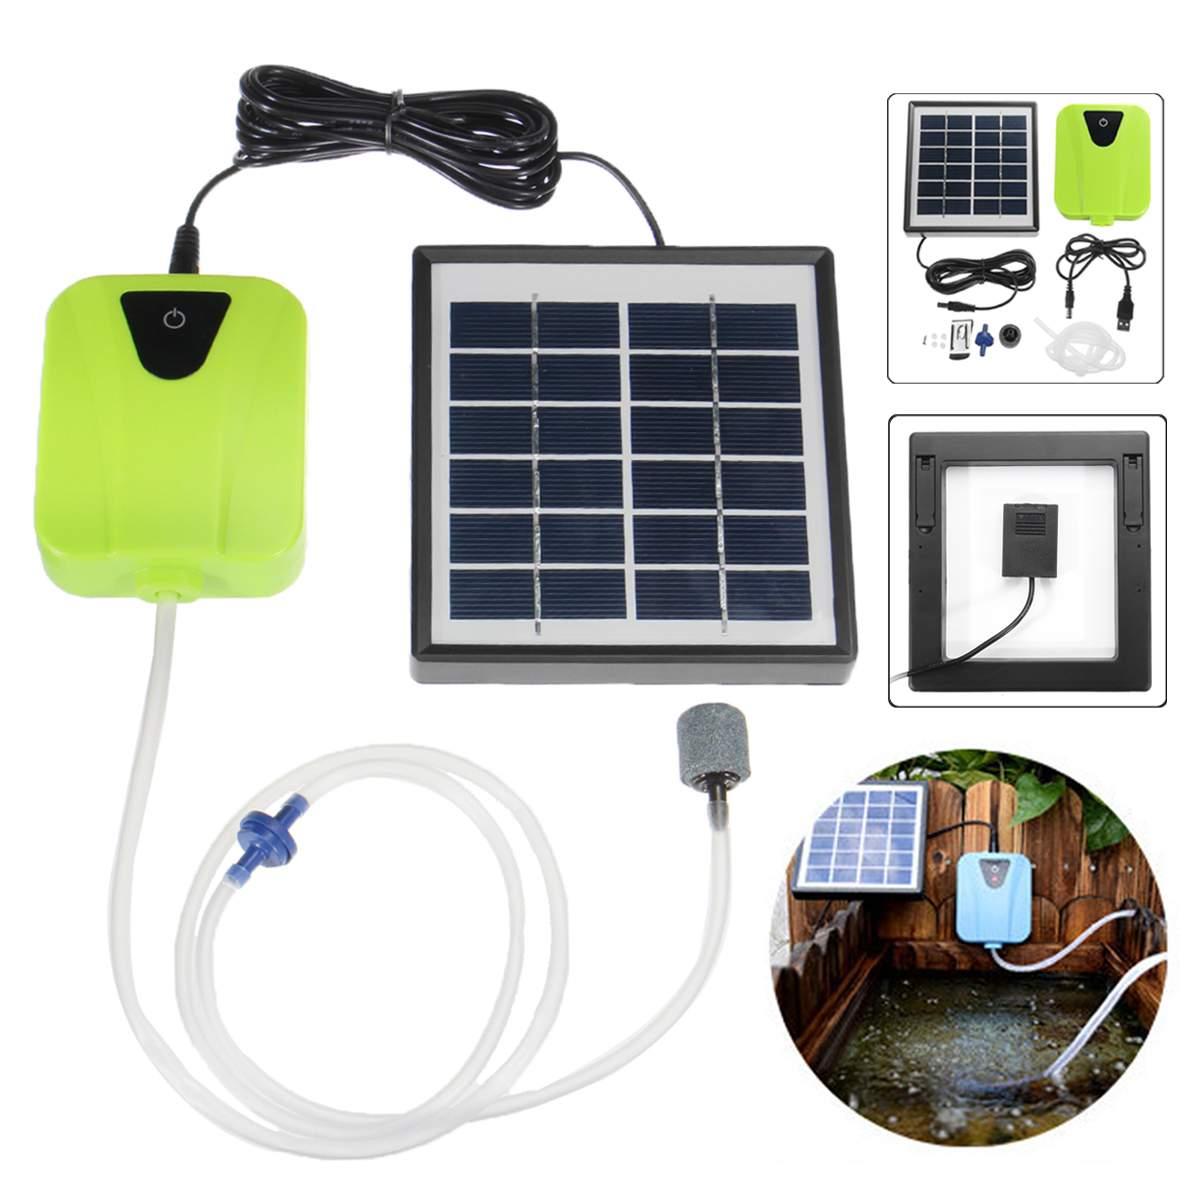 2.5W Aquarium Air Pump Solar Powered USB Charging Oxygen Aerator Oxygen Pump Fish Tank Air Flow Maker With Air Stone